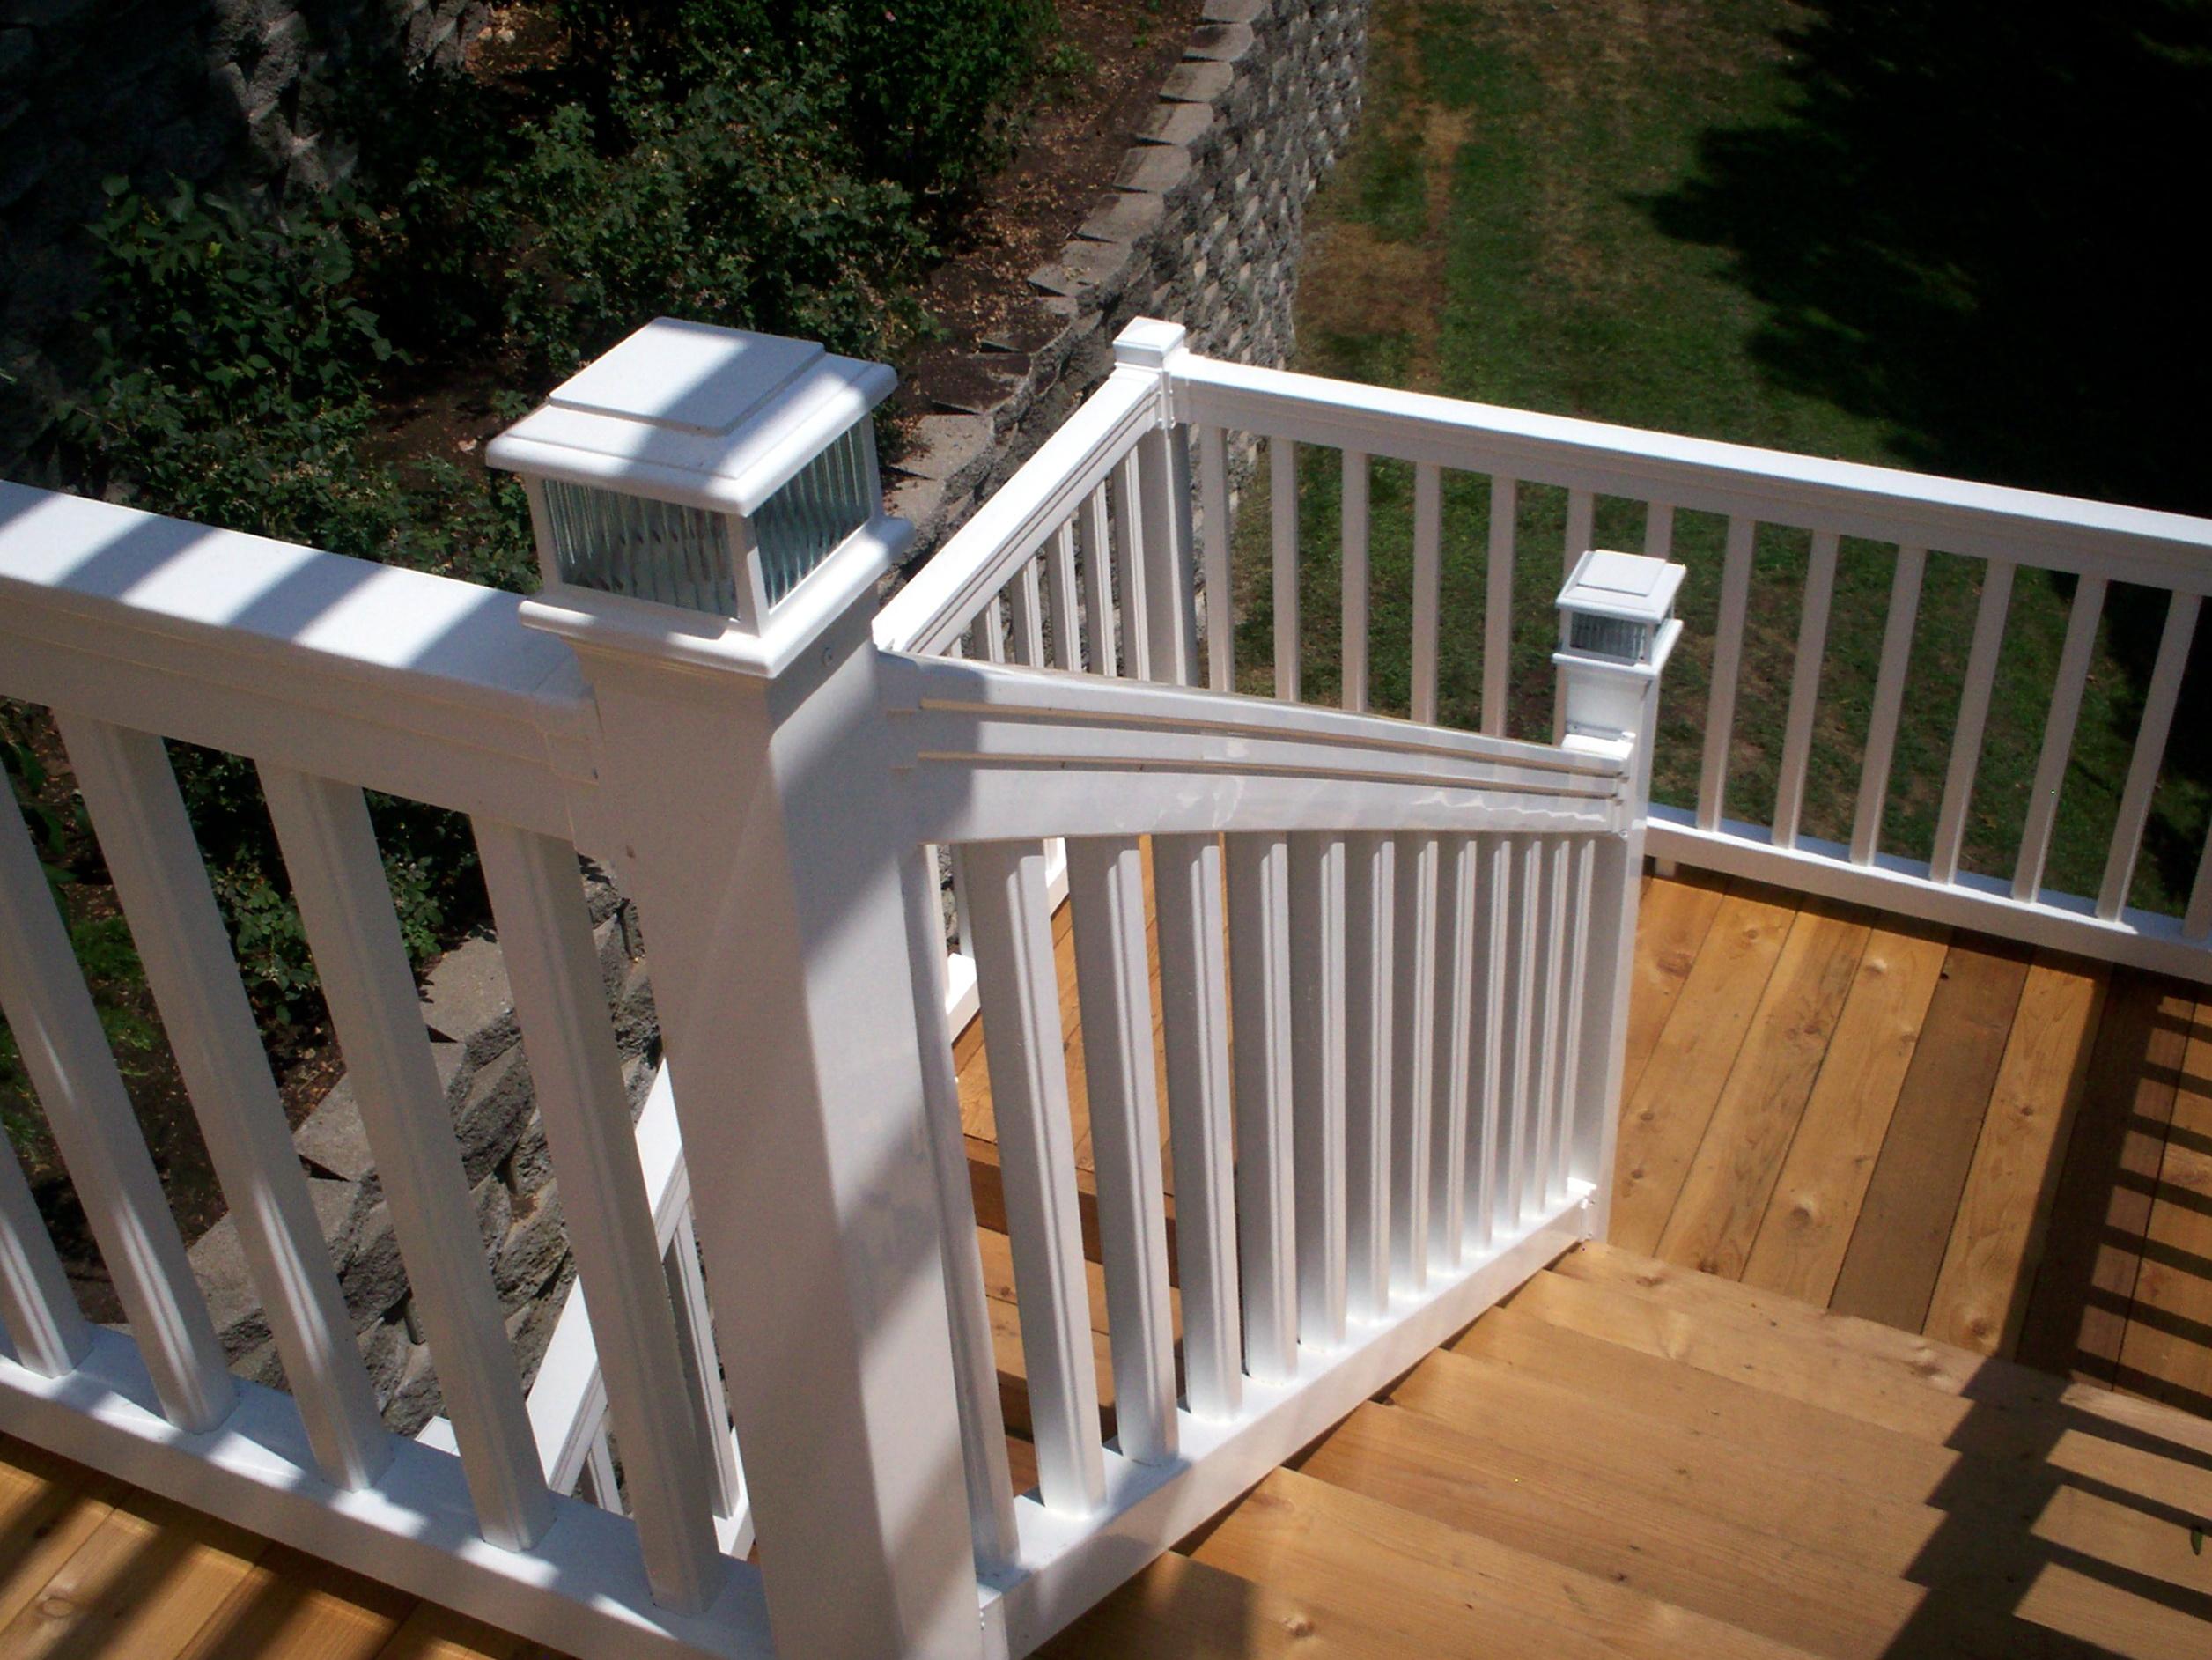 Standard Railing Height Deck Stairs Home Design Ideas